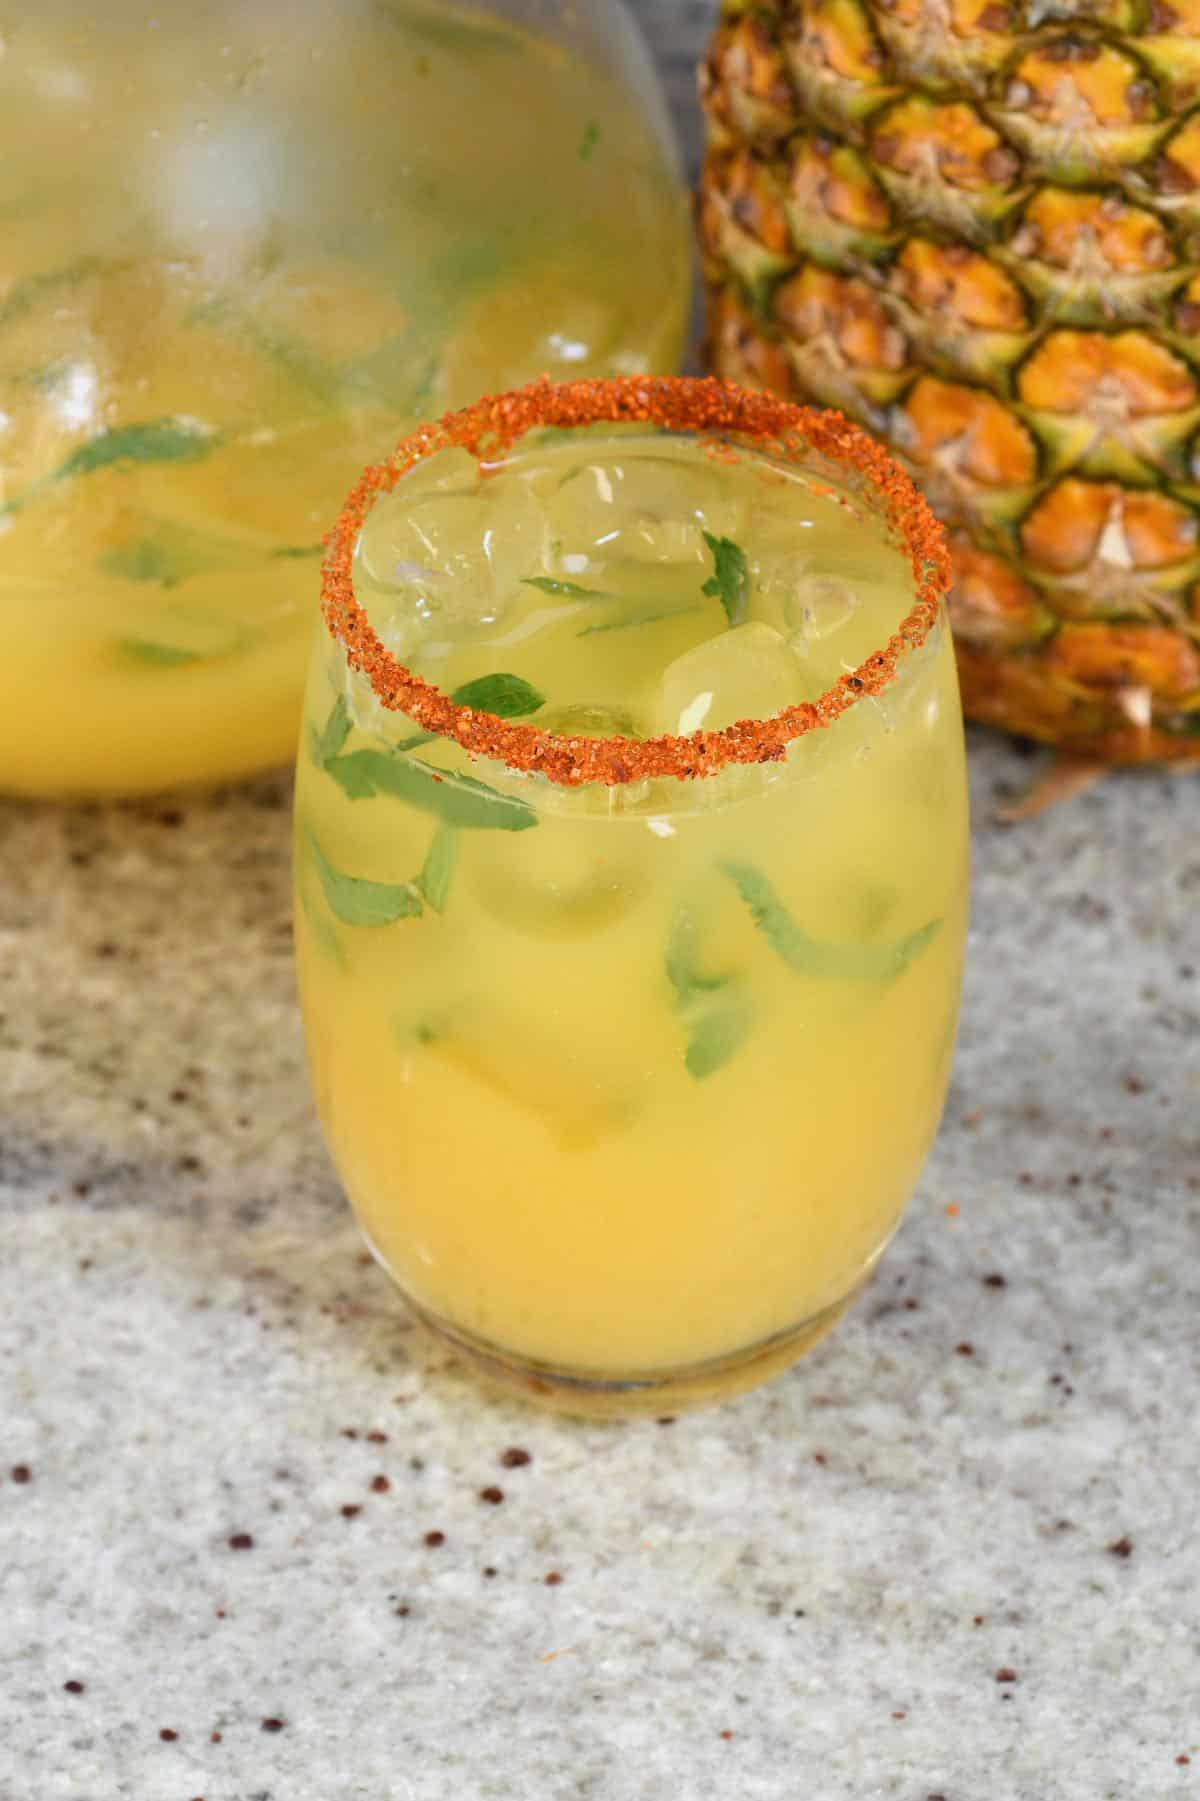 Pineapple orange juice in a glass